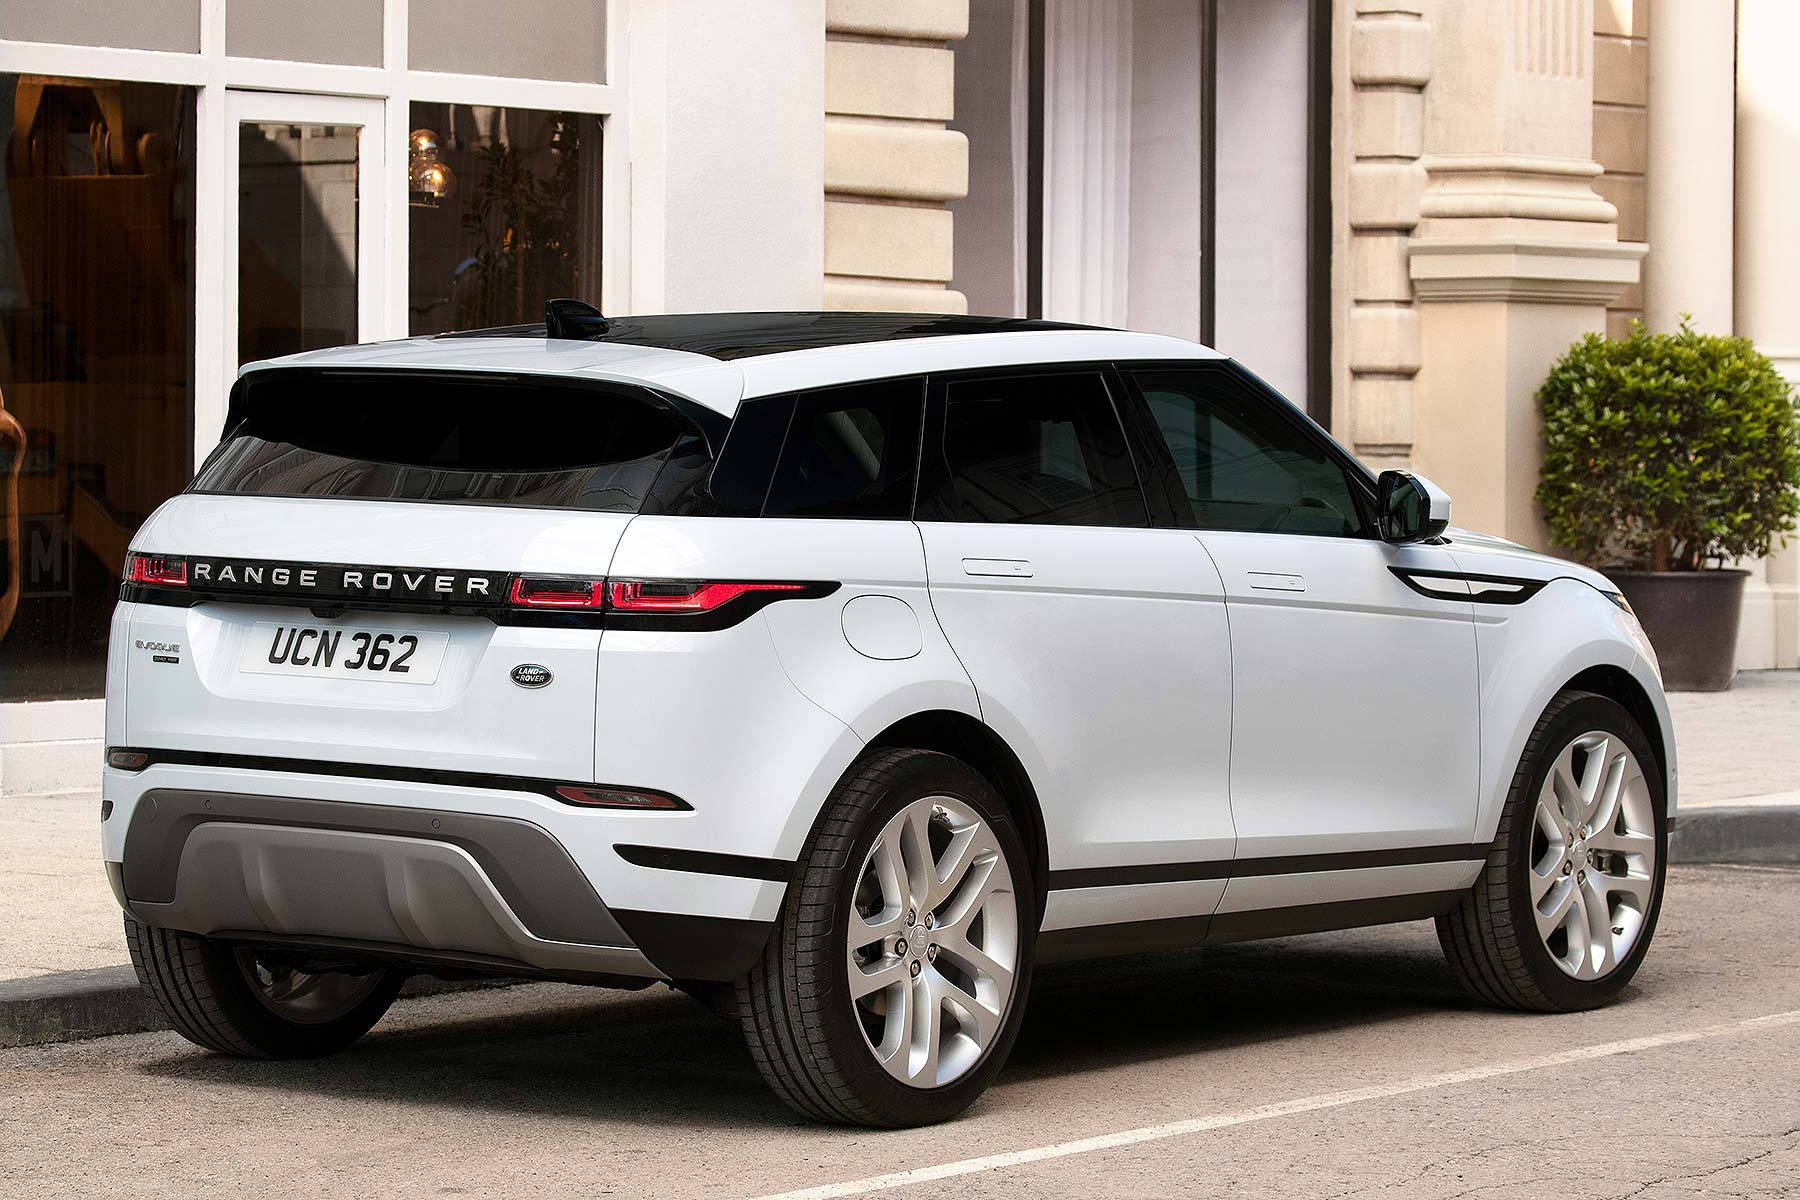 2019 range rover evoque motoring research. Black Bedroom Furniture Sets. Home Design Ideas